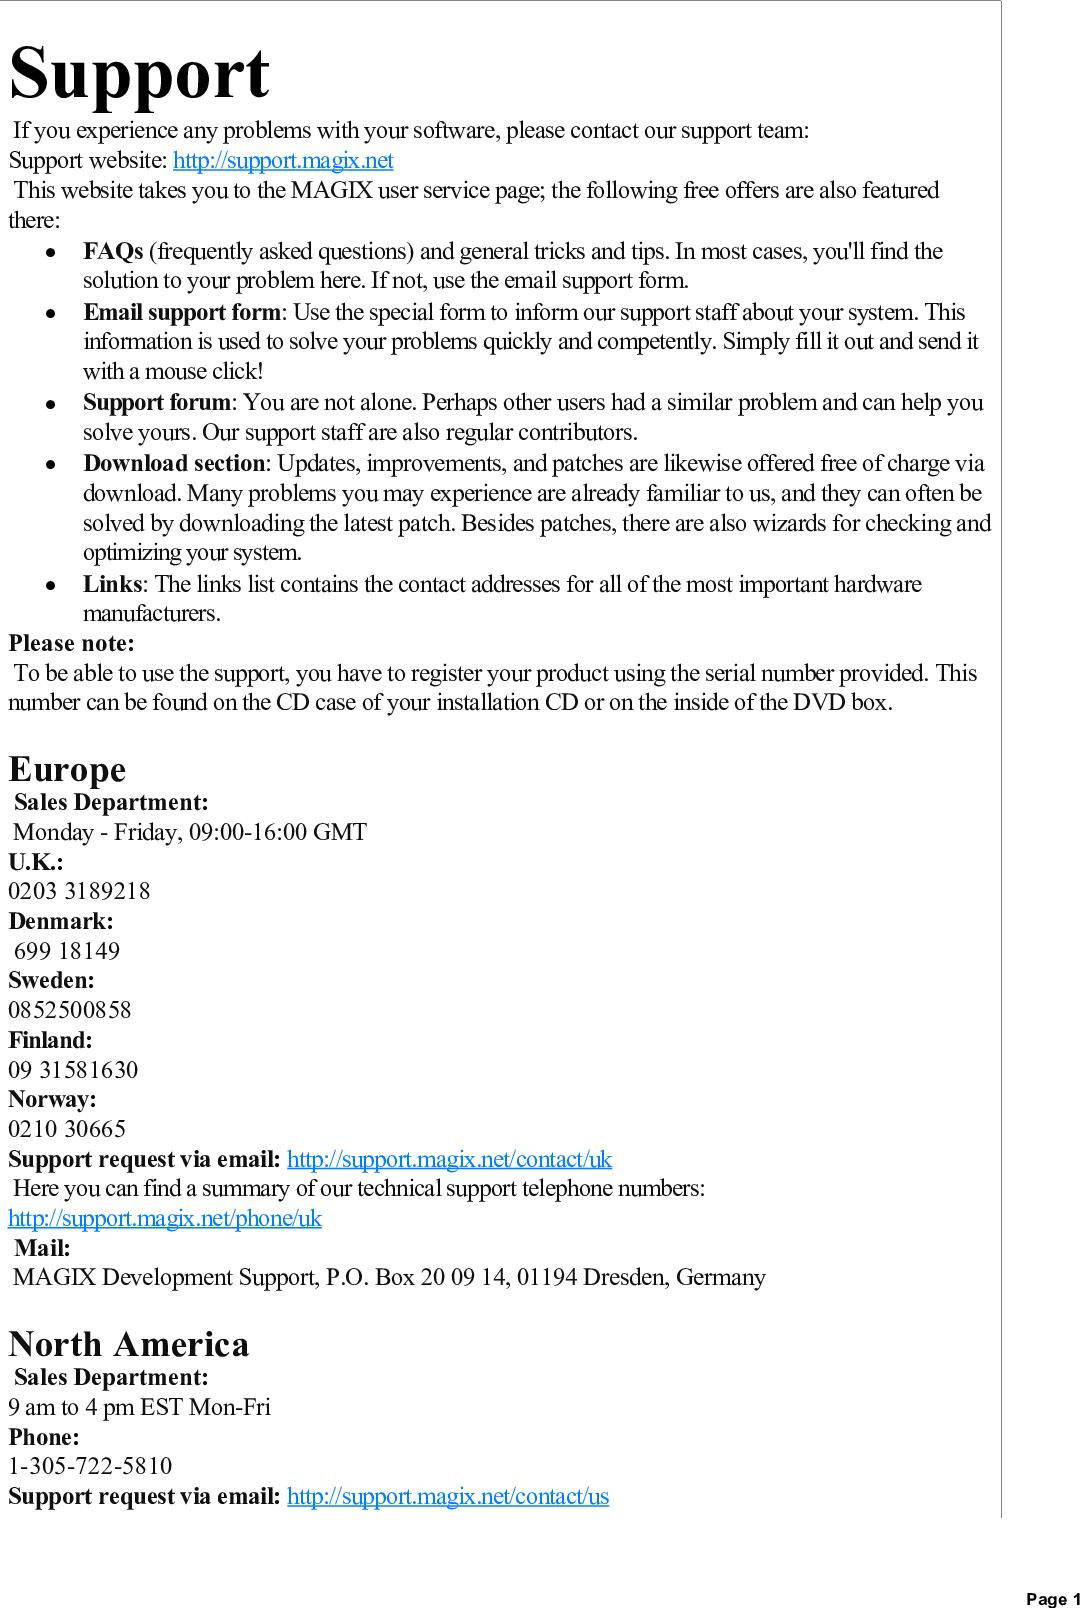 saeco magic deluxe user manual